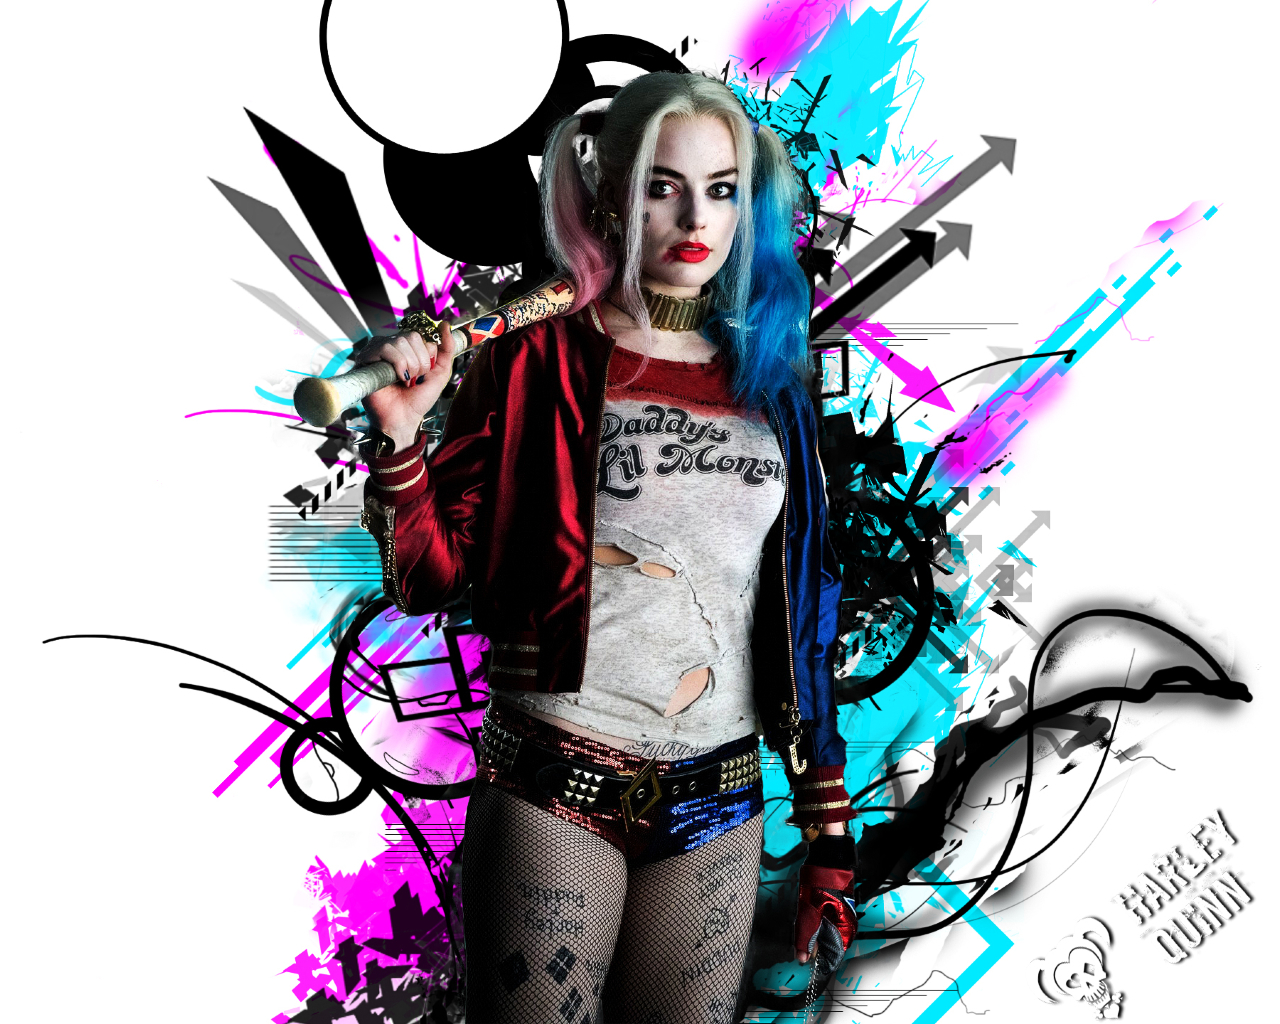 Harley Quinn 4k Hd Wallpapers